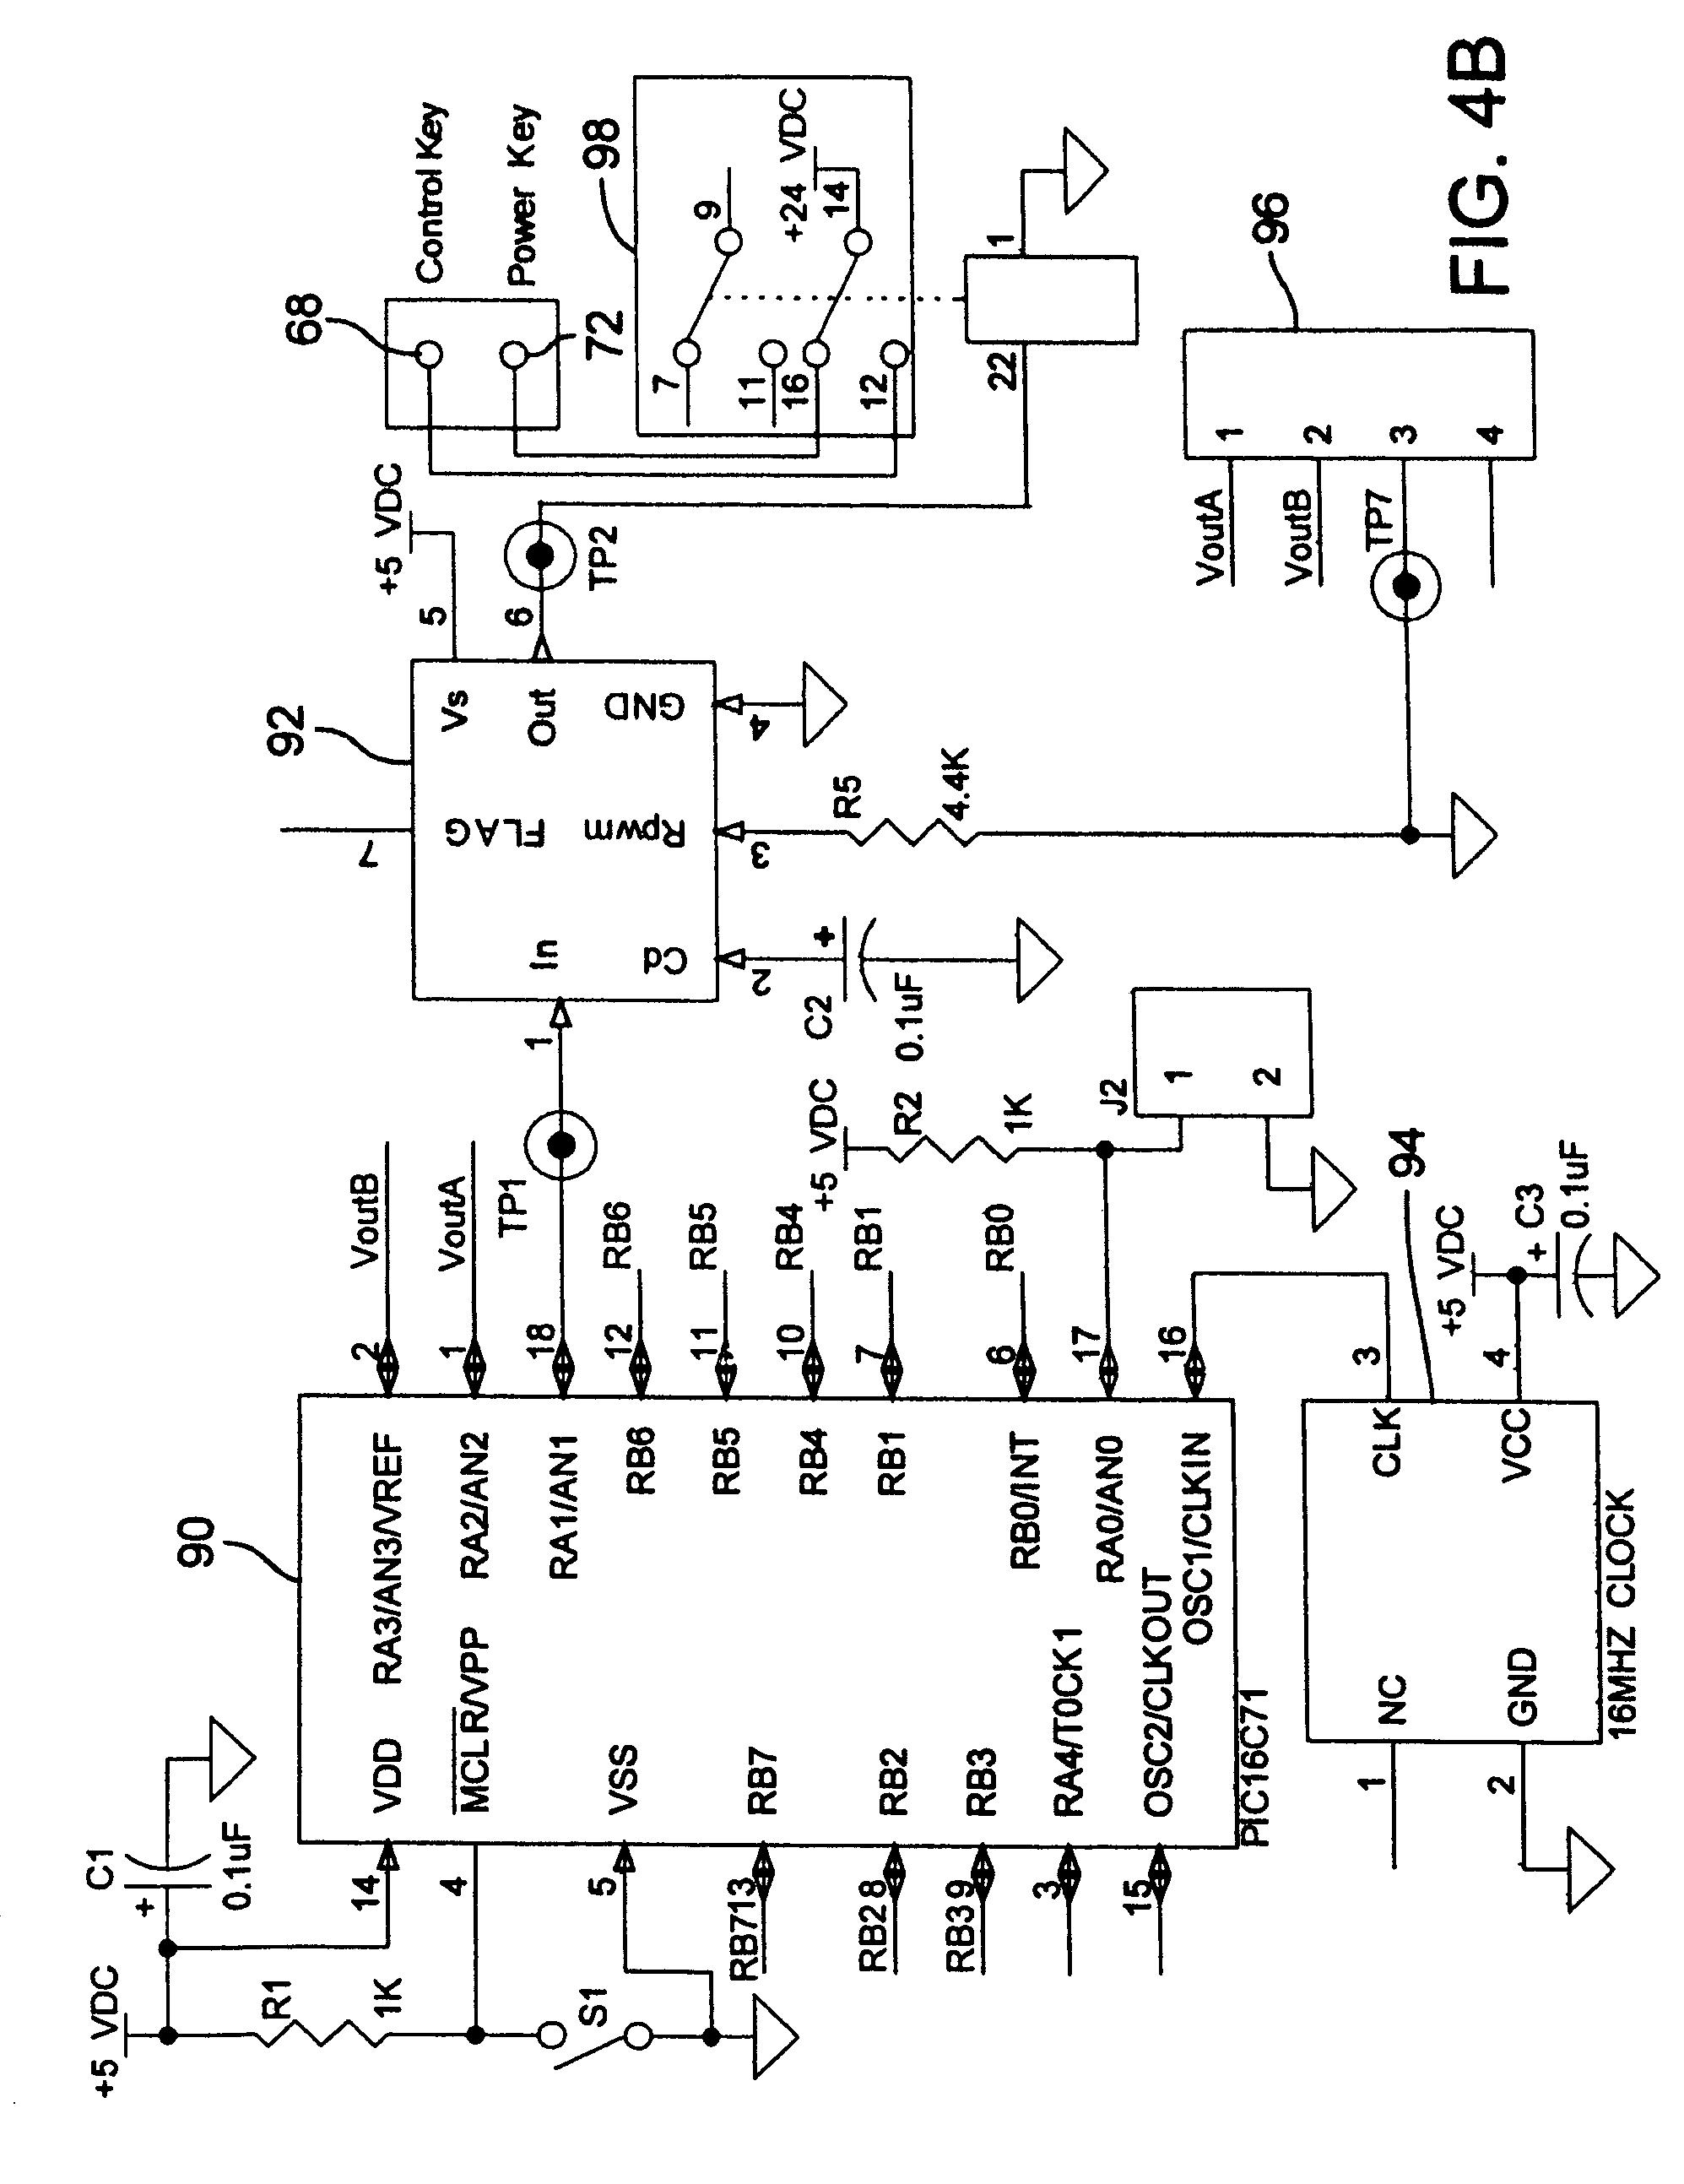 fortress interlock wiring diagram auto electrical wiring diagram Hyundai Elantra Graphics fortress interlock wiring diagram 33 wiring diagram